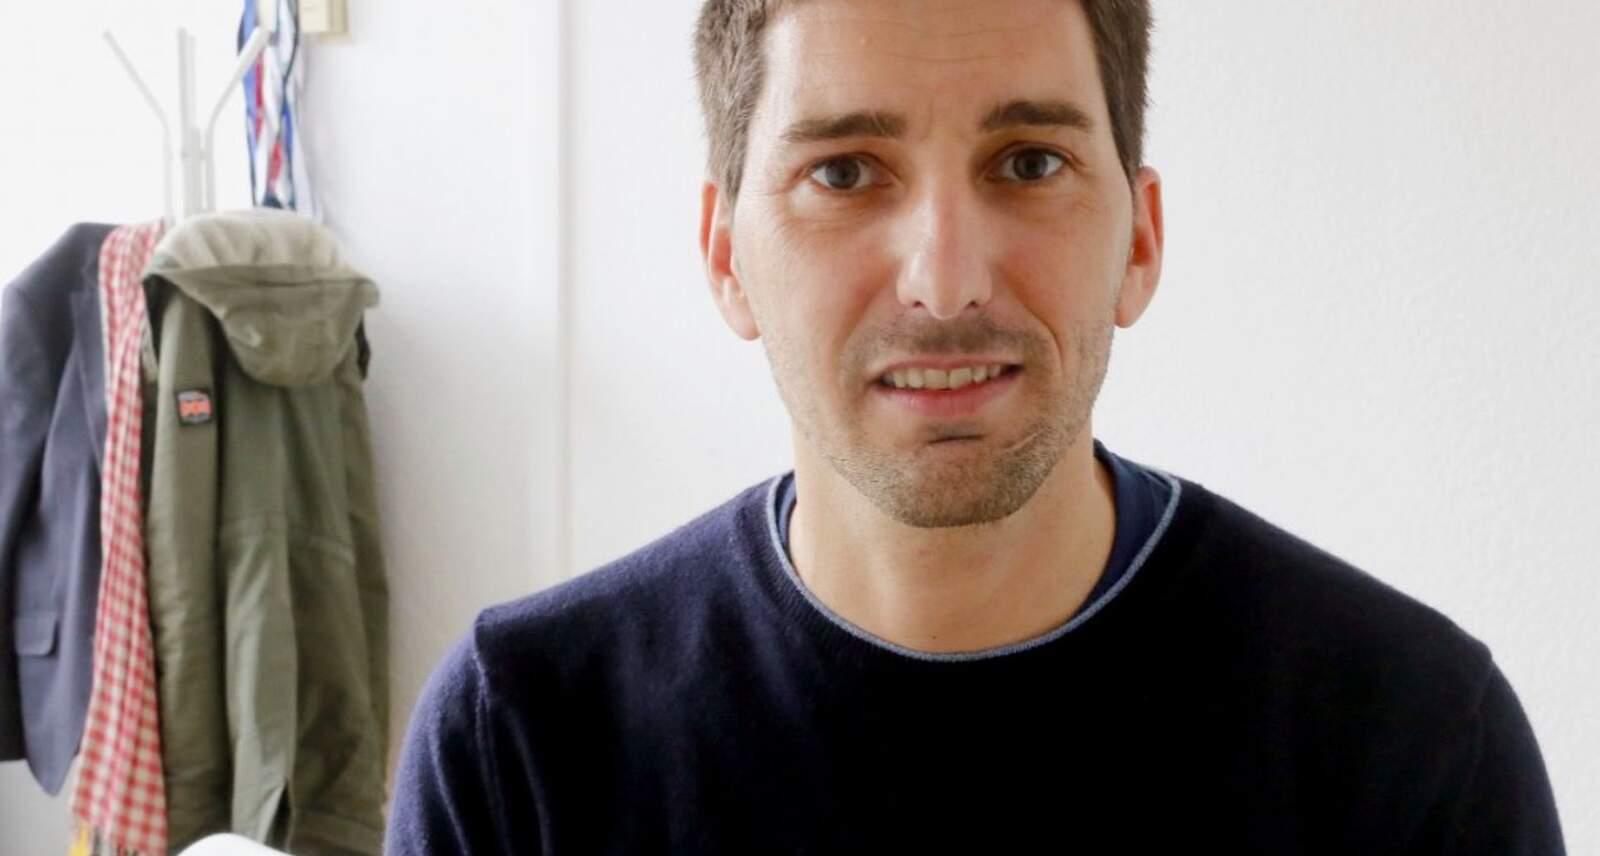 L'epidemiòleg Oriol Mitjà